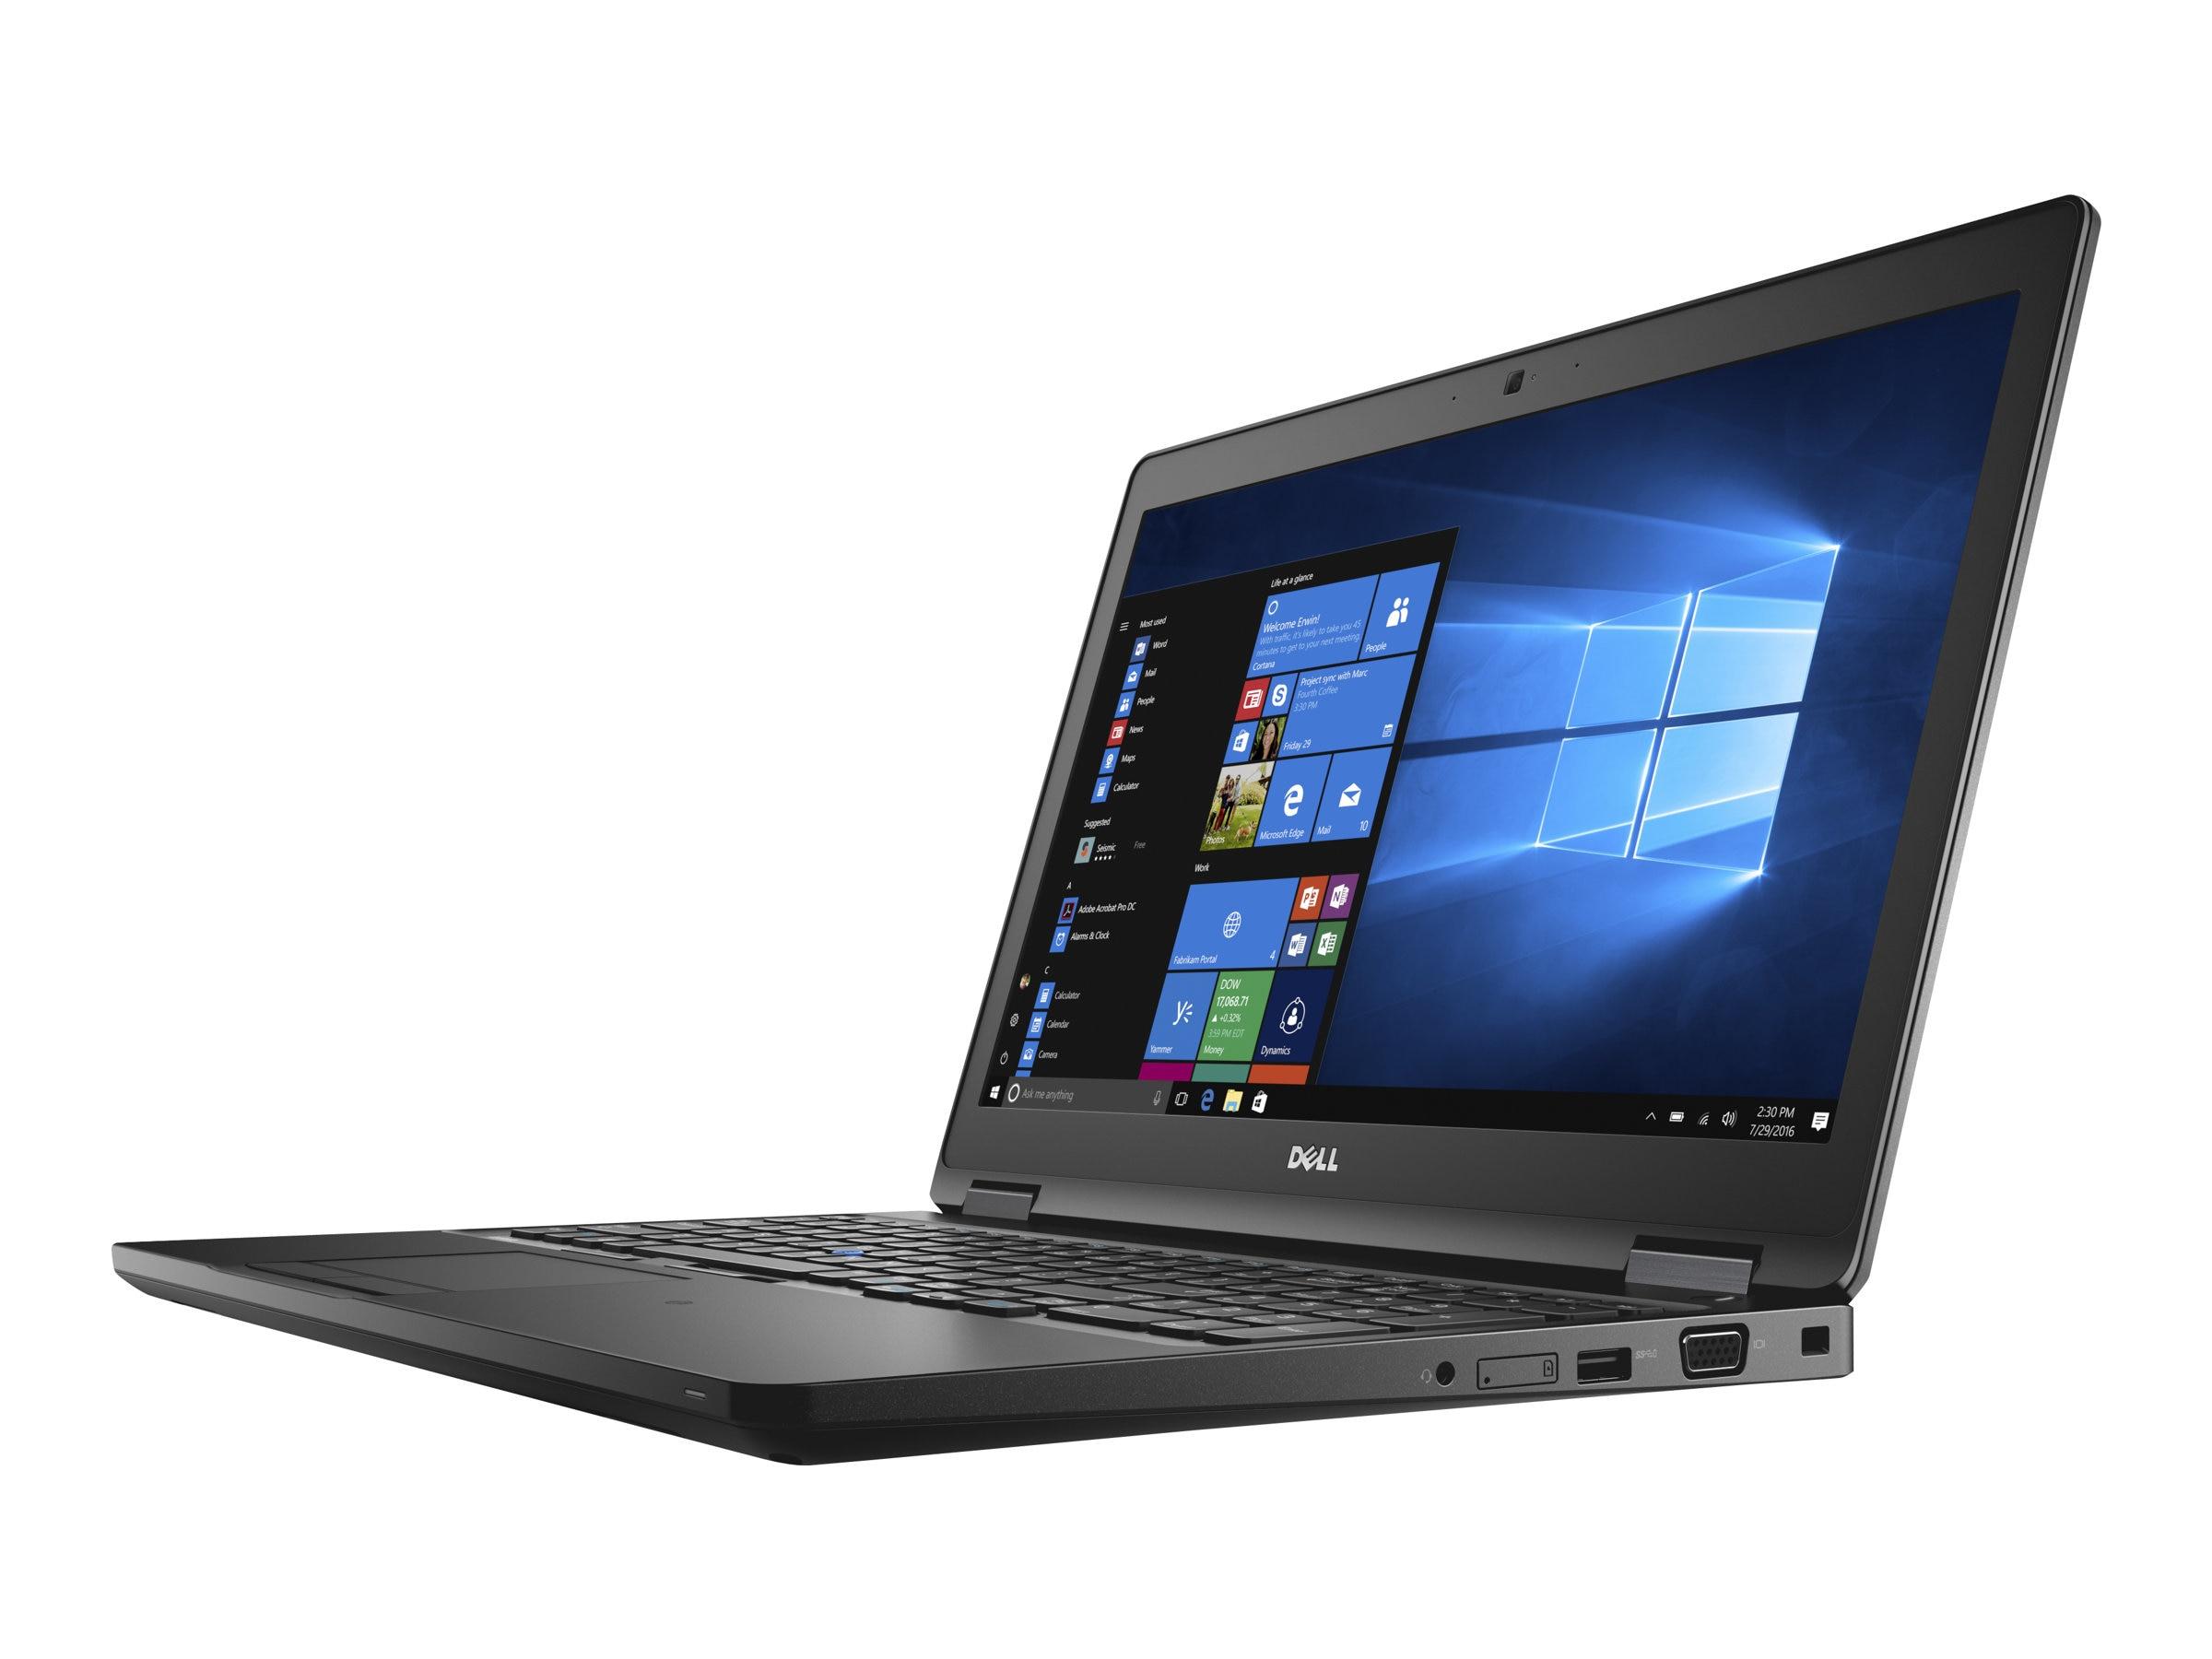 Dell Latitude 5580 Core i5-7300U 2.6GHz 8GB 500GB ac BT WC 4C 15 HD W10P64, N3JC6, 33644208, Notebooks